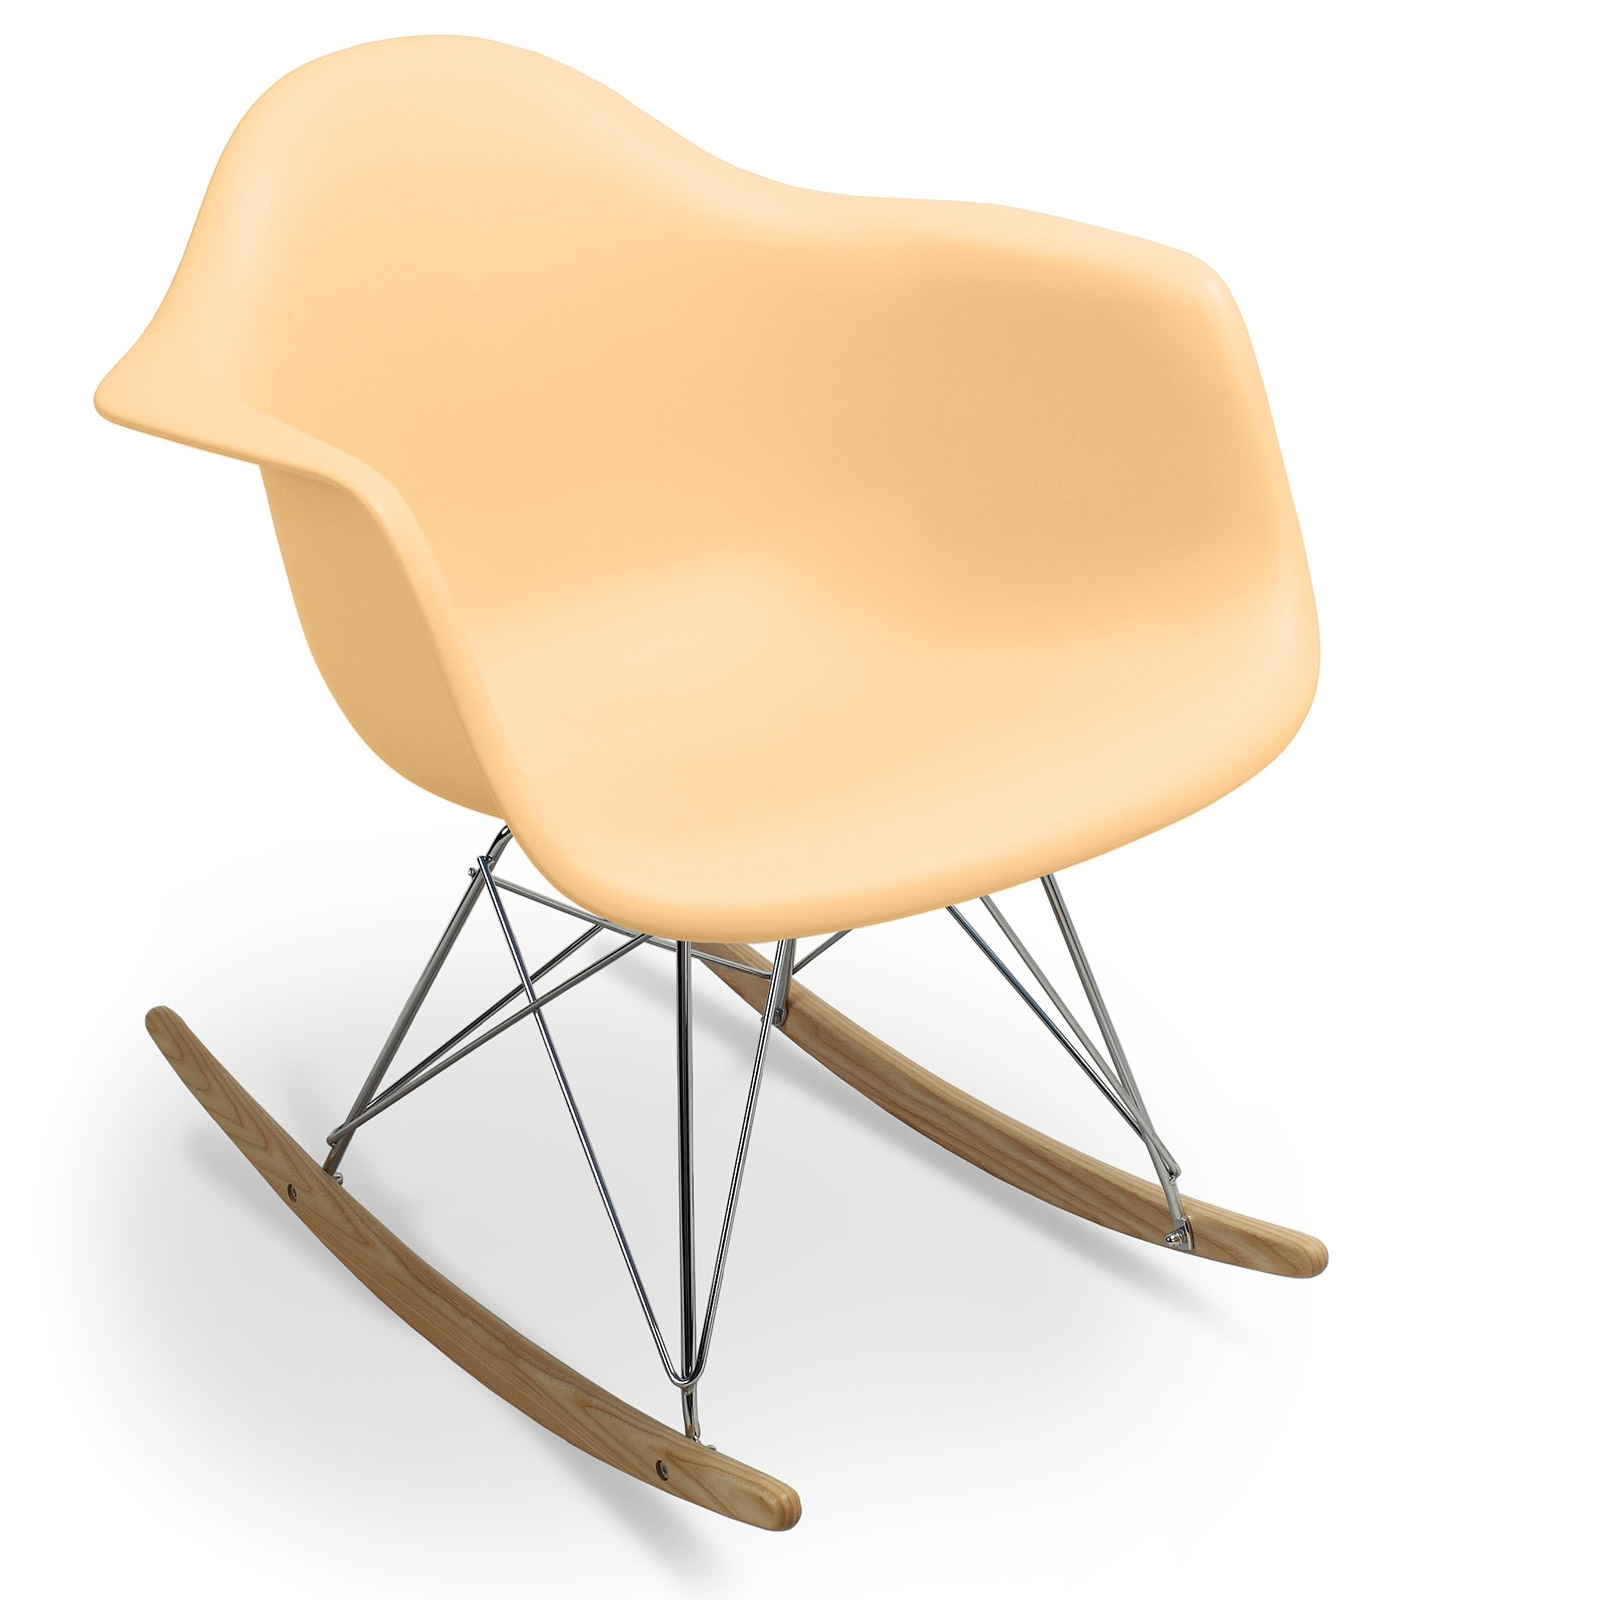 fauteuil bascule orange pastel mat inspir e charles eames. Black Bedroom Furniture Sets. Home Design Ideas